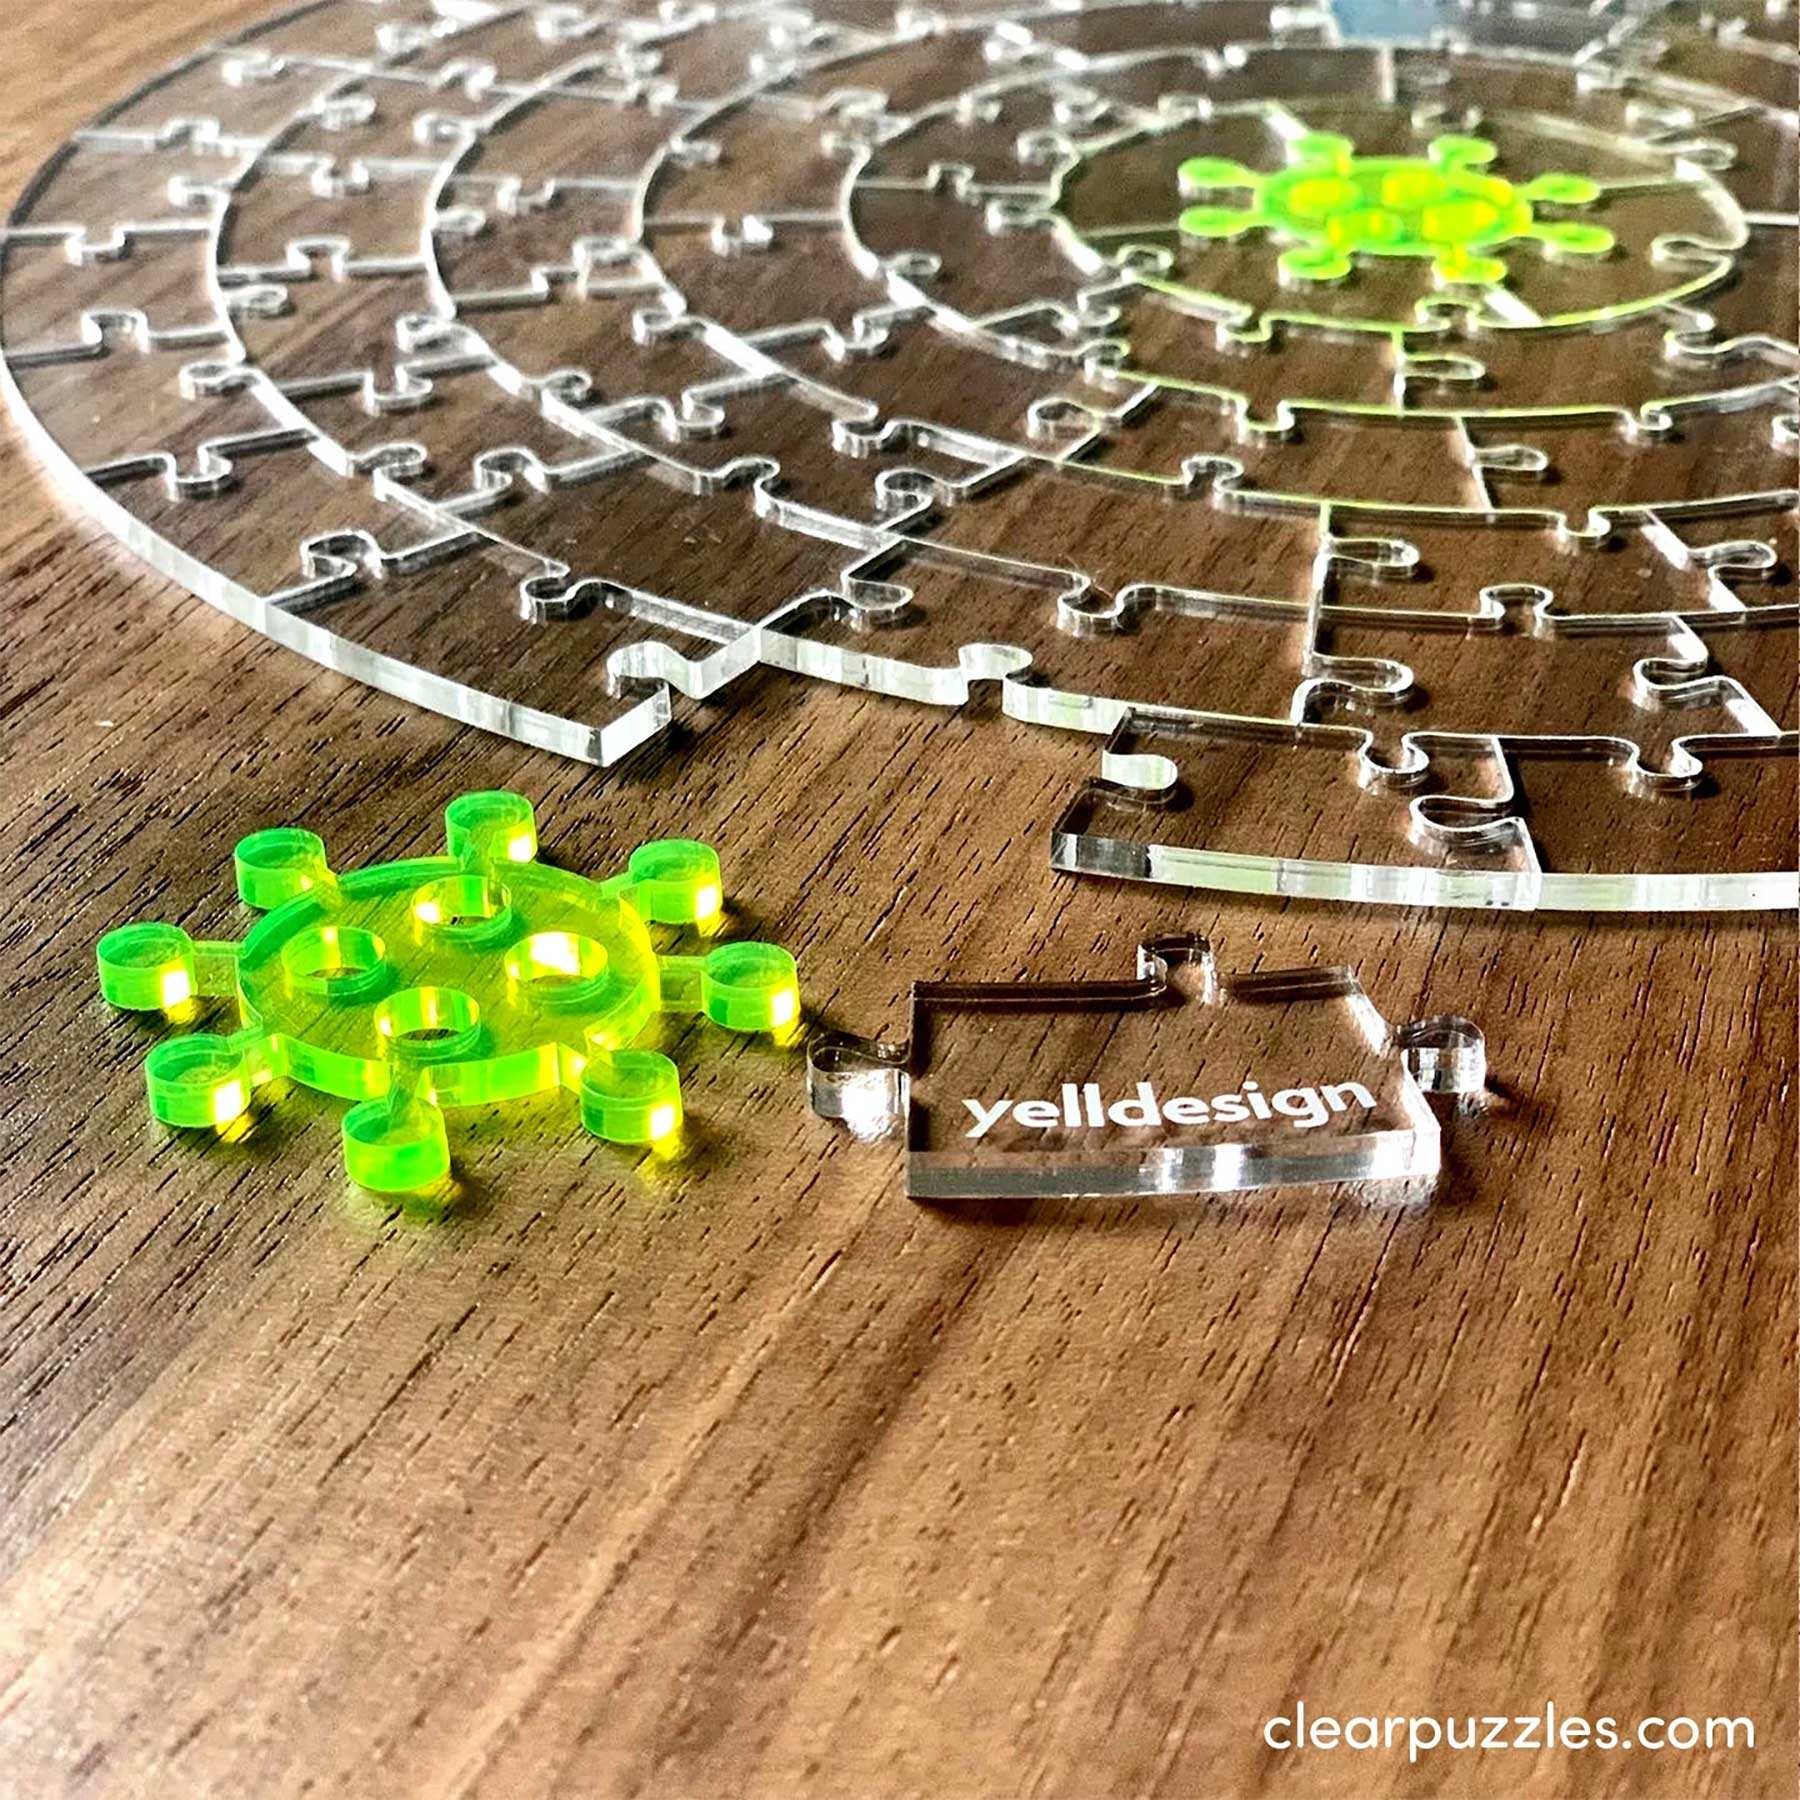 Durchsichtiges Puzzle puzzle-aus-glas-The-virus_clear-jigsaw_02